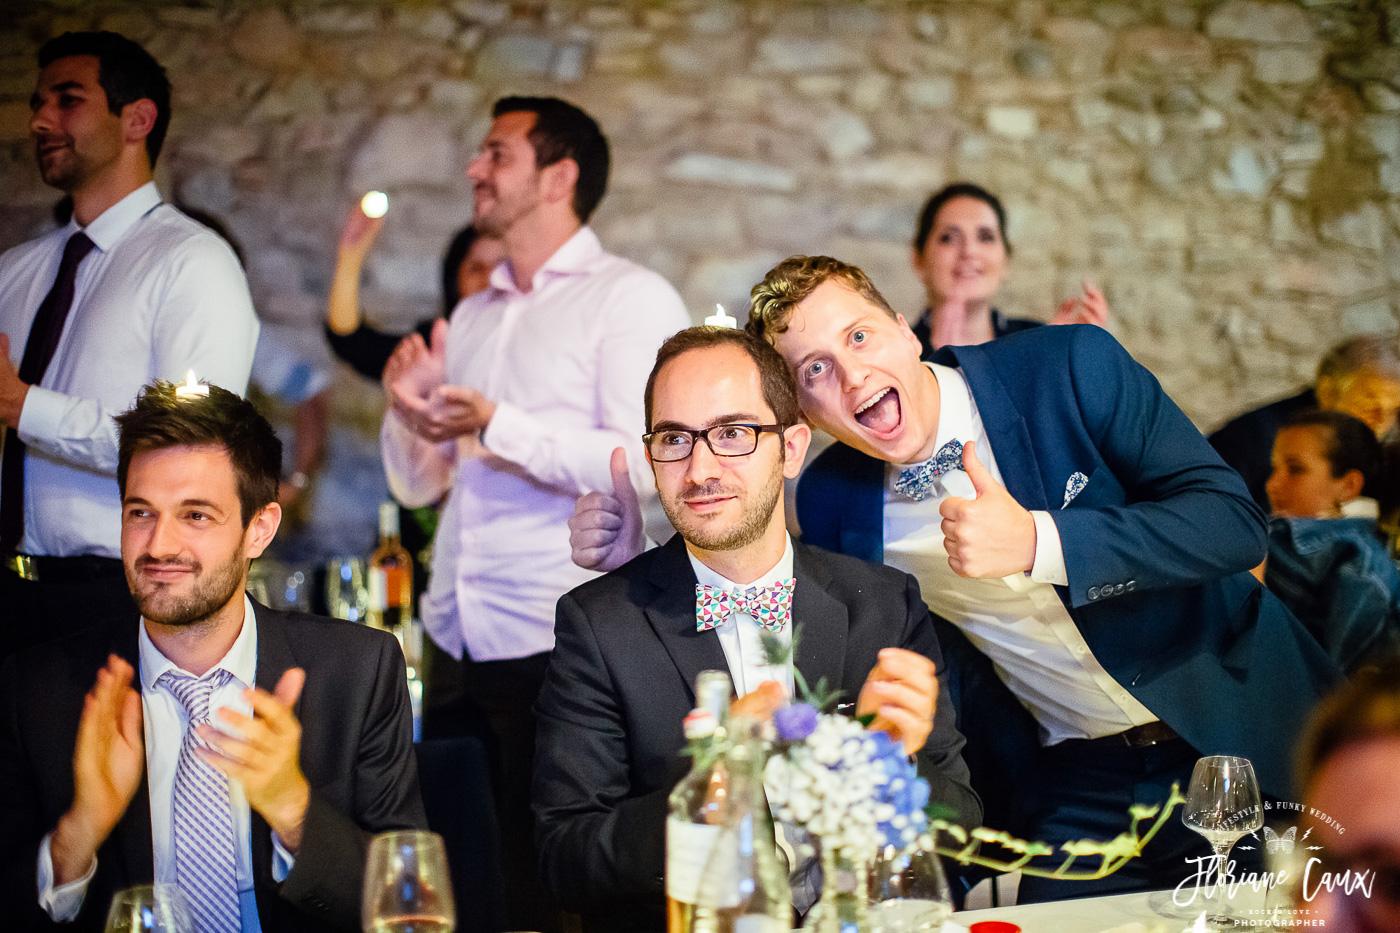 photographe-mariage-pays-basque-Floriane-Caux (99)